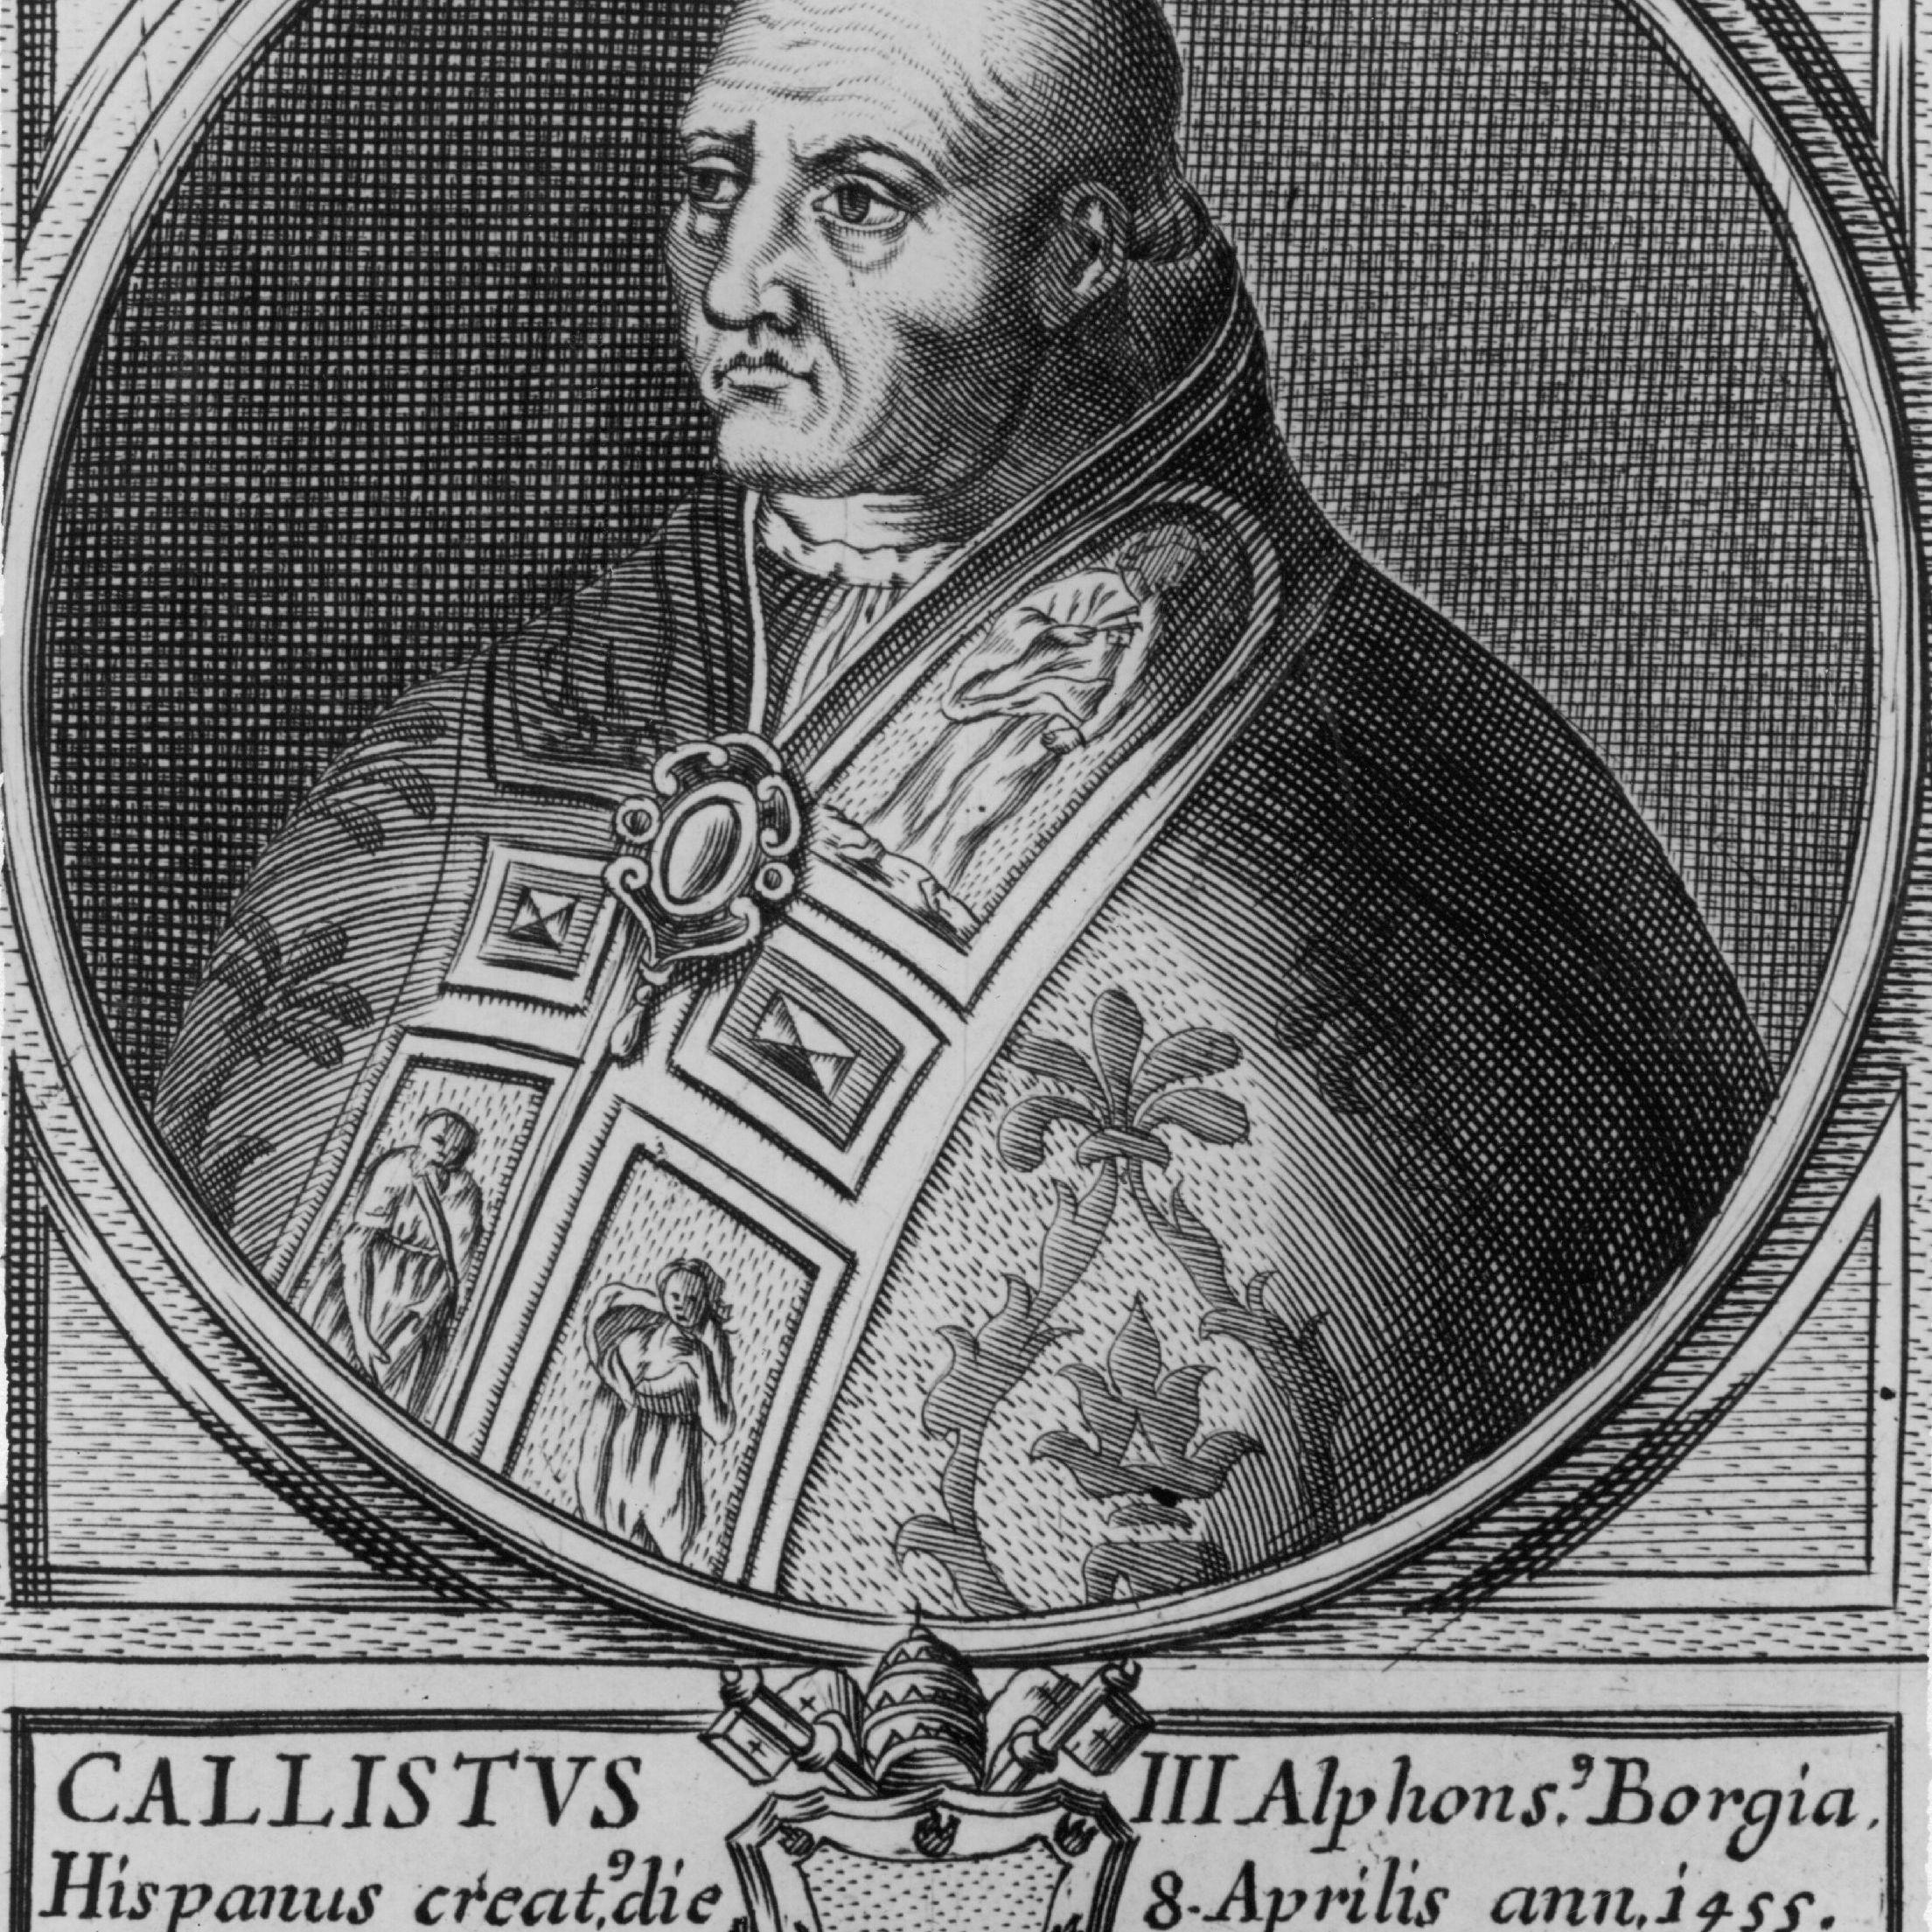 Illustrated portrait of Calixtus III